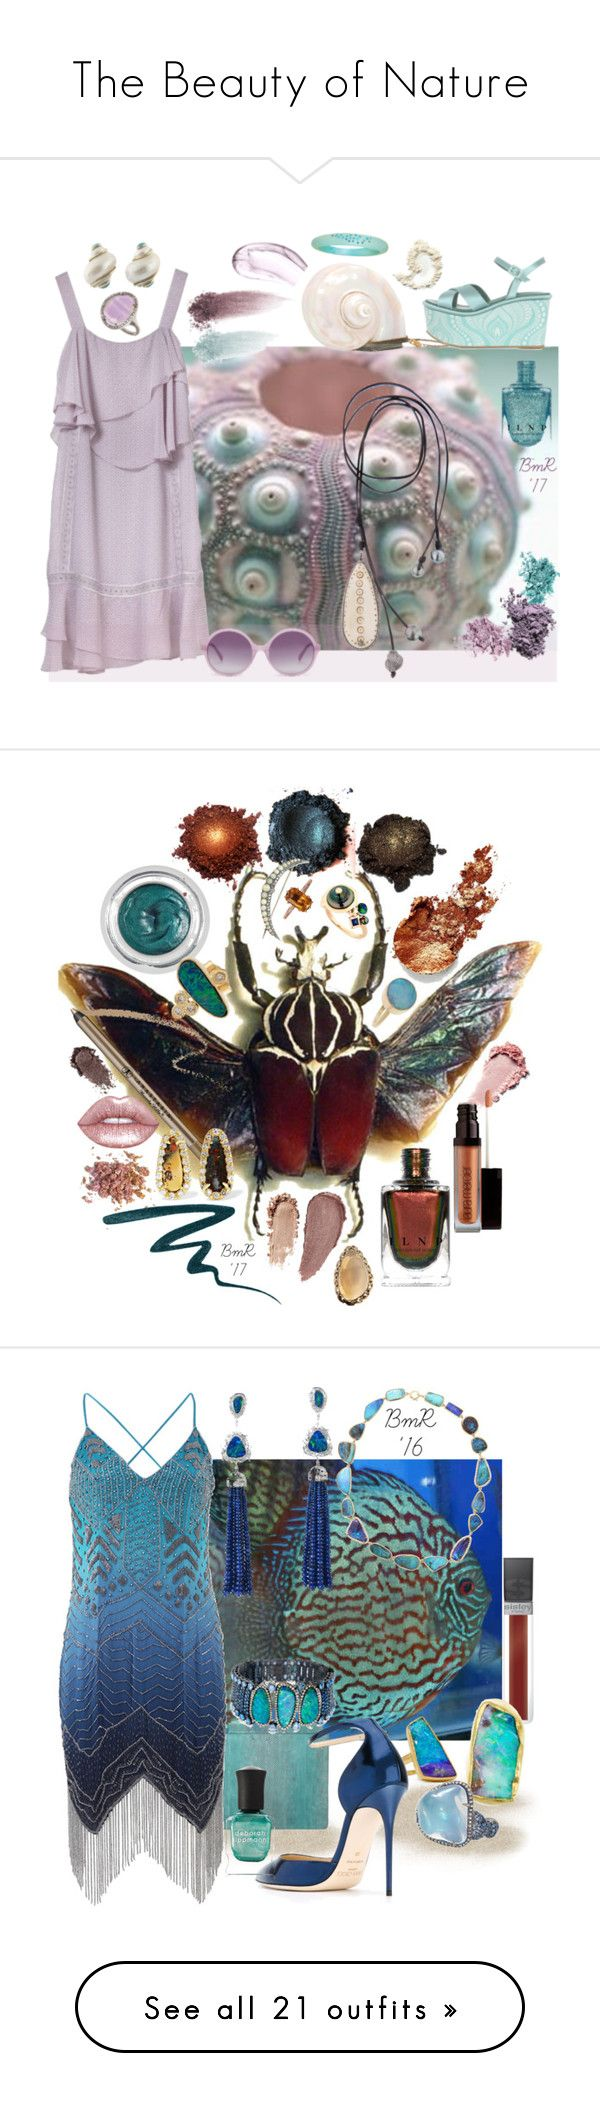 """The Beauty of Nature"" by barbmama ❤ liked on Polyvore featuring Massimo Lonardo, Chantecaille, Laura Mercier, NARS Cosmetics, Kala, Seaman Schepps, Heidi London, BillyTheTree, Phillip Gavriel and beauty"